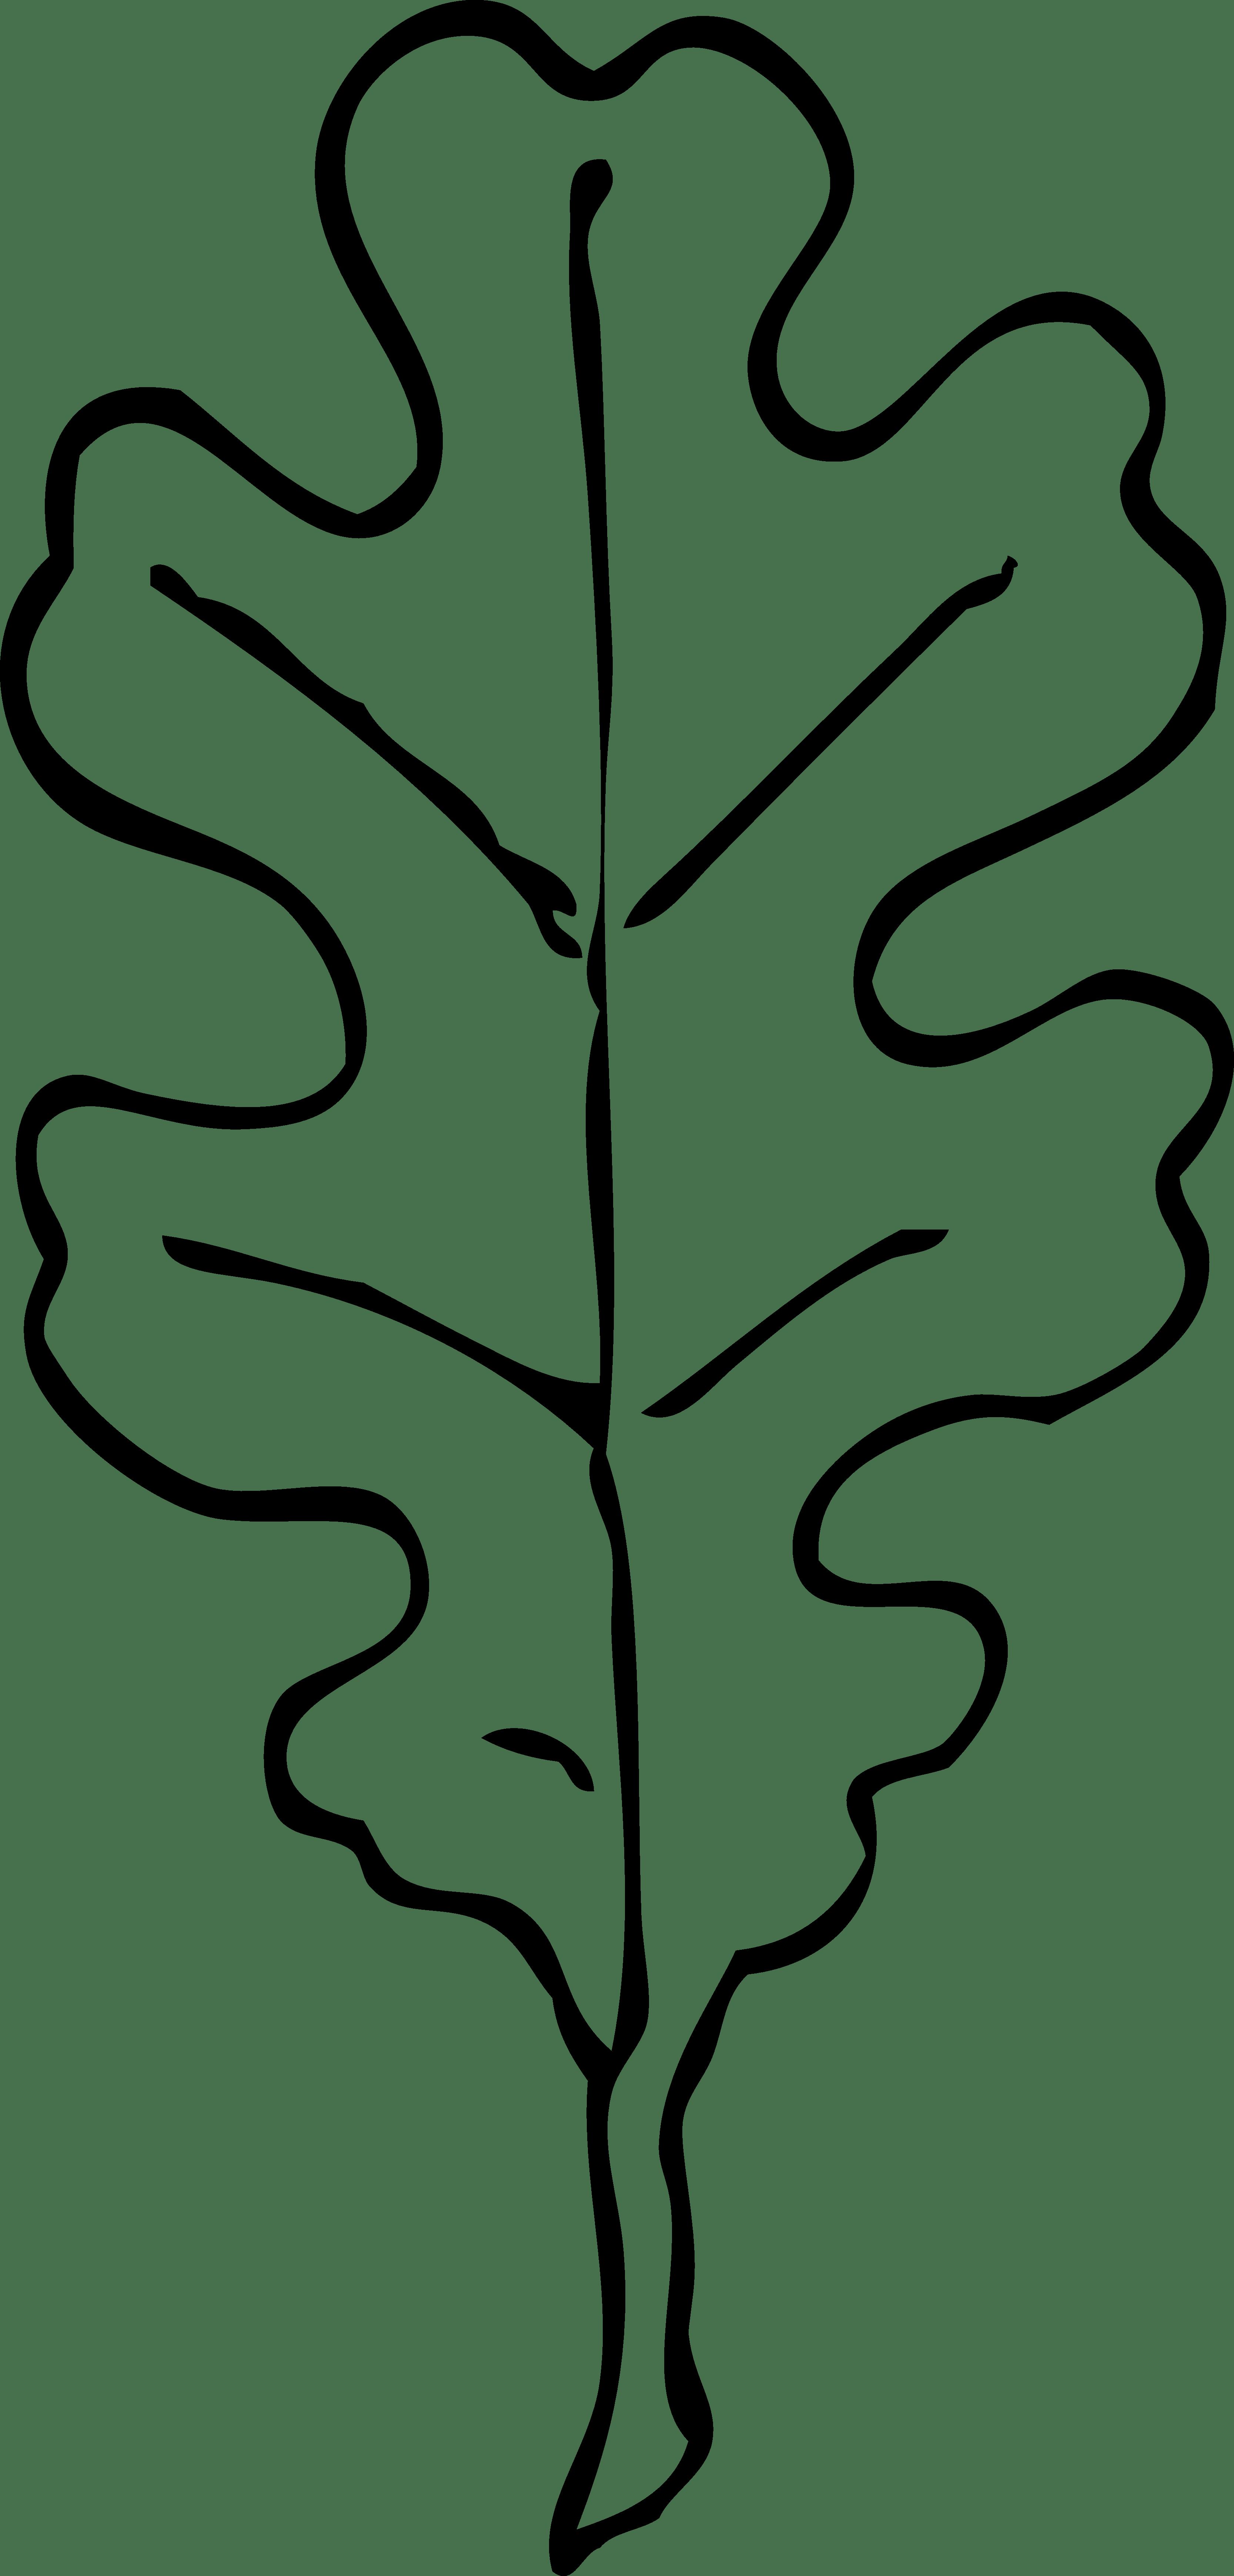 Autumn Leaf Outline Clip Art